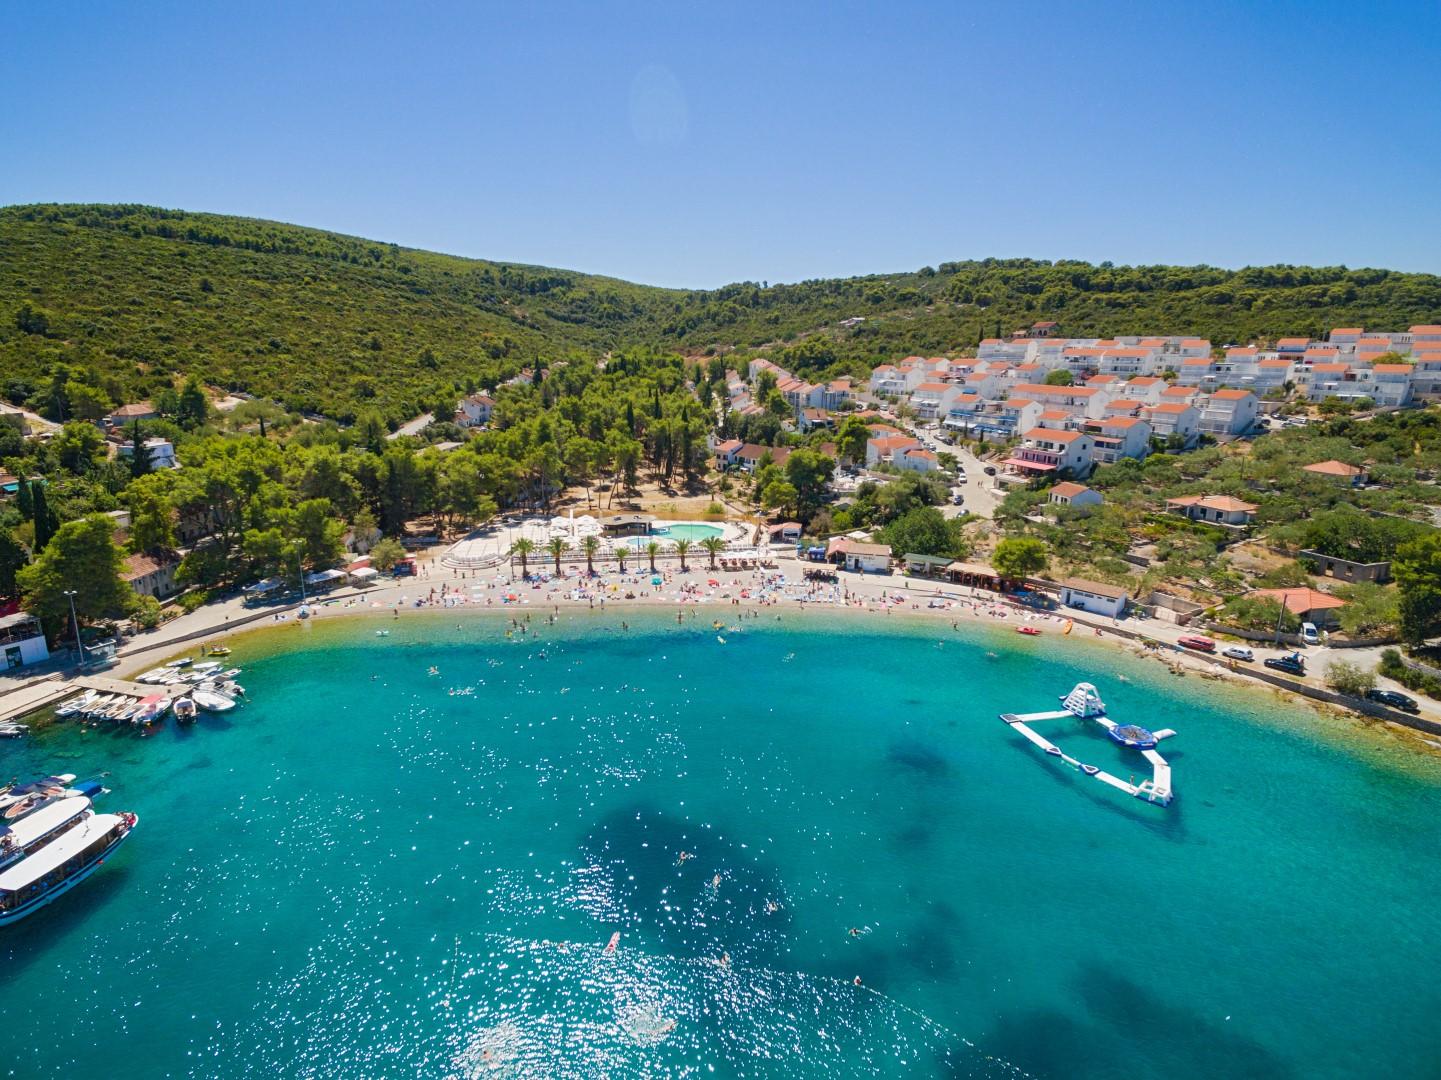 Necujam bay, Solta, Croatia